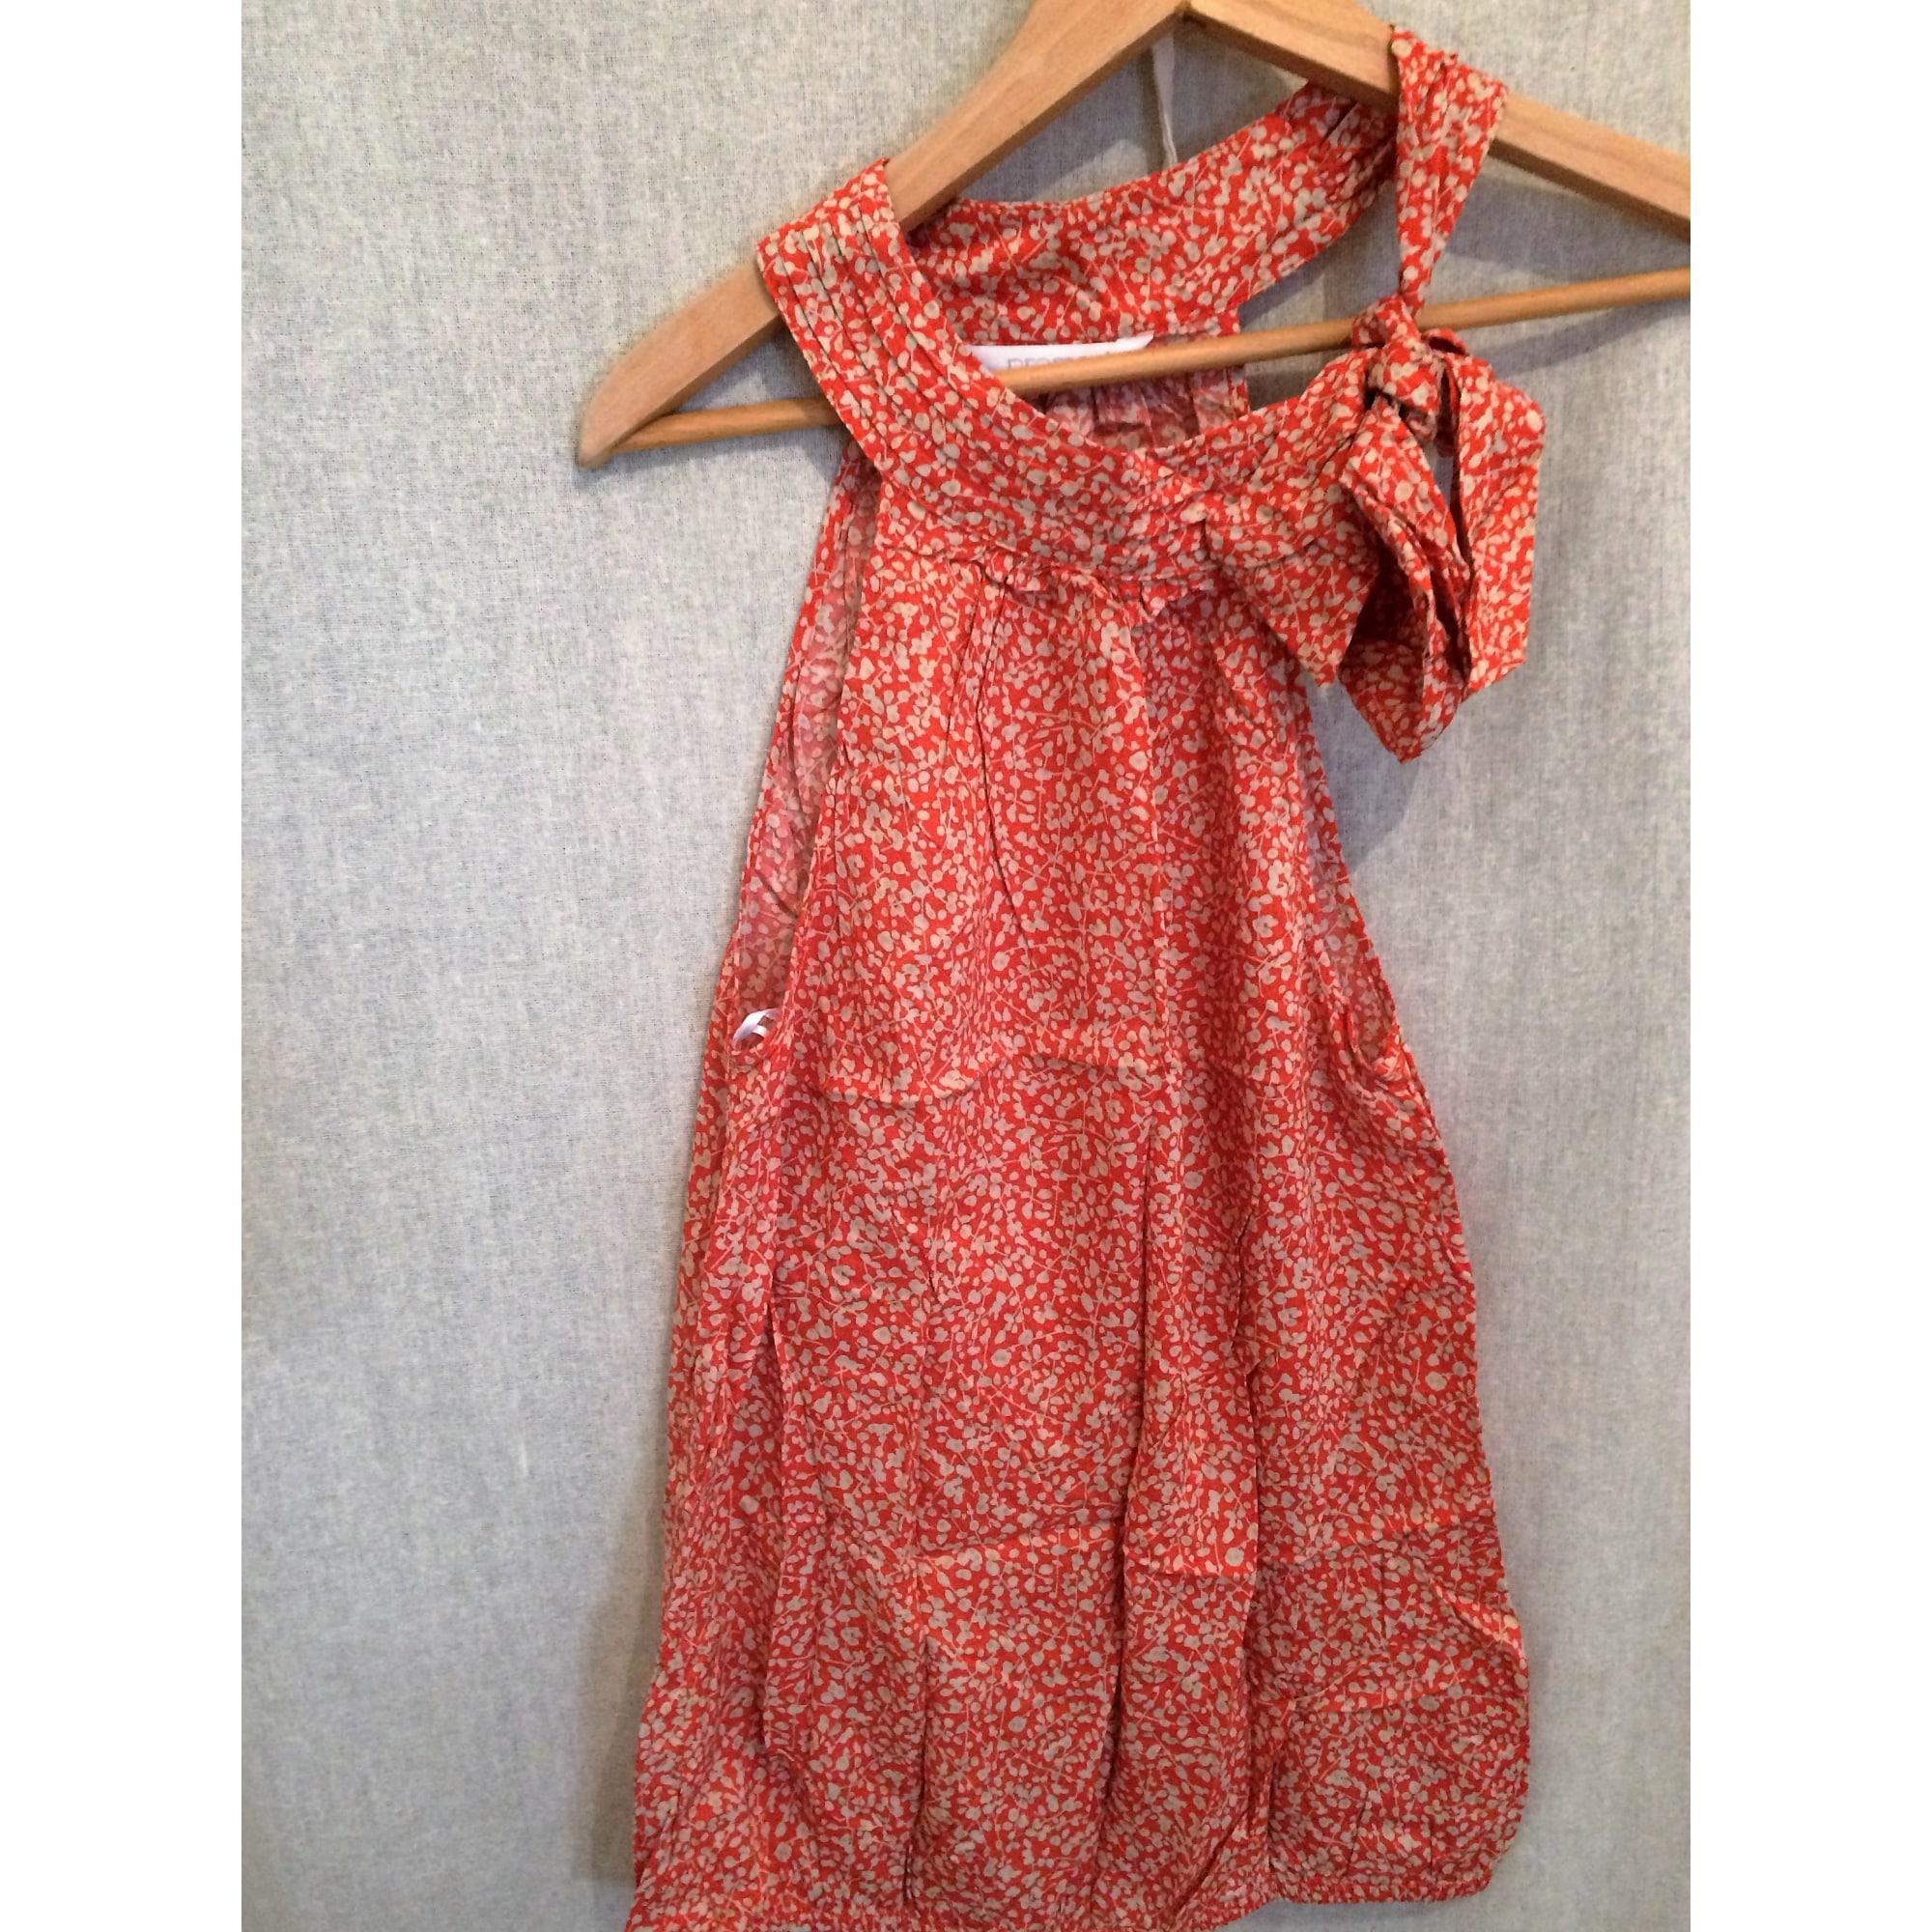 Top, tee-shirt PROMOD Orange